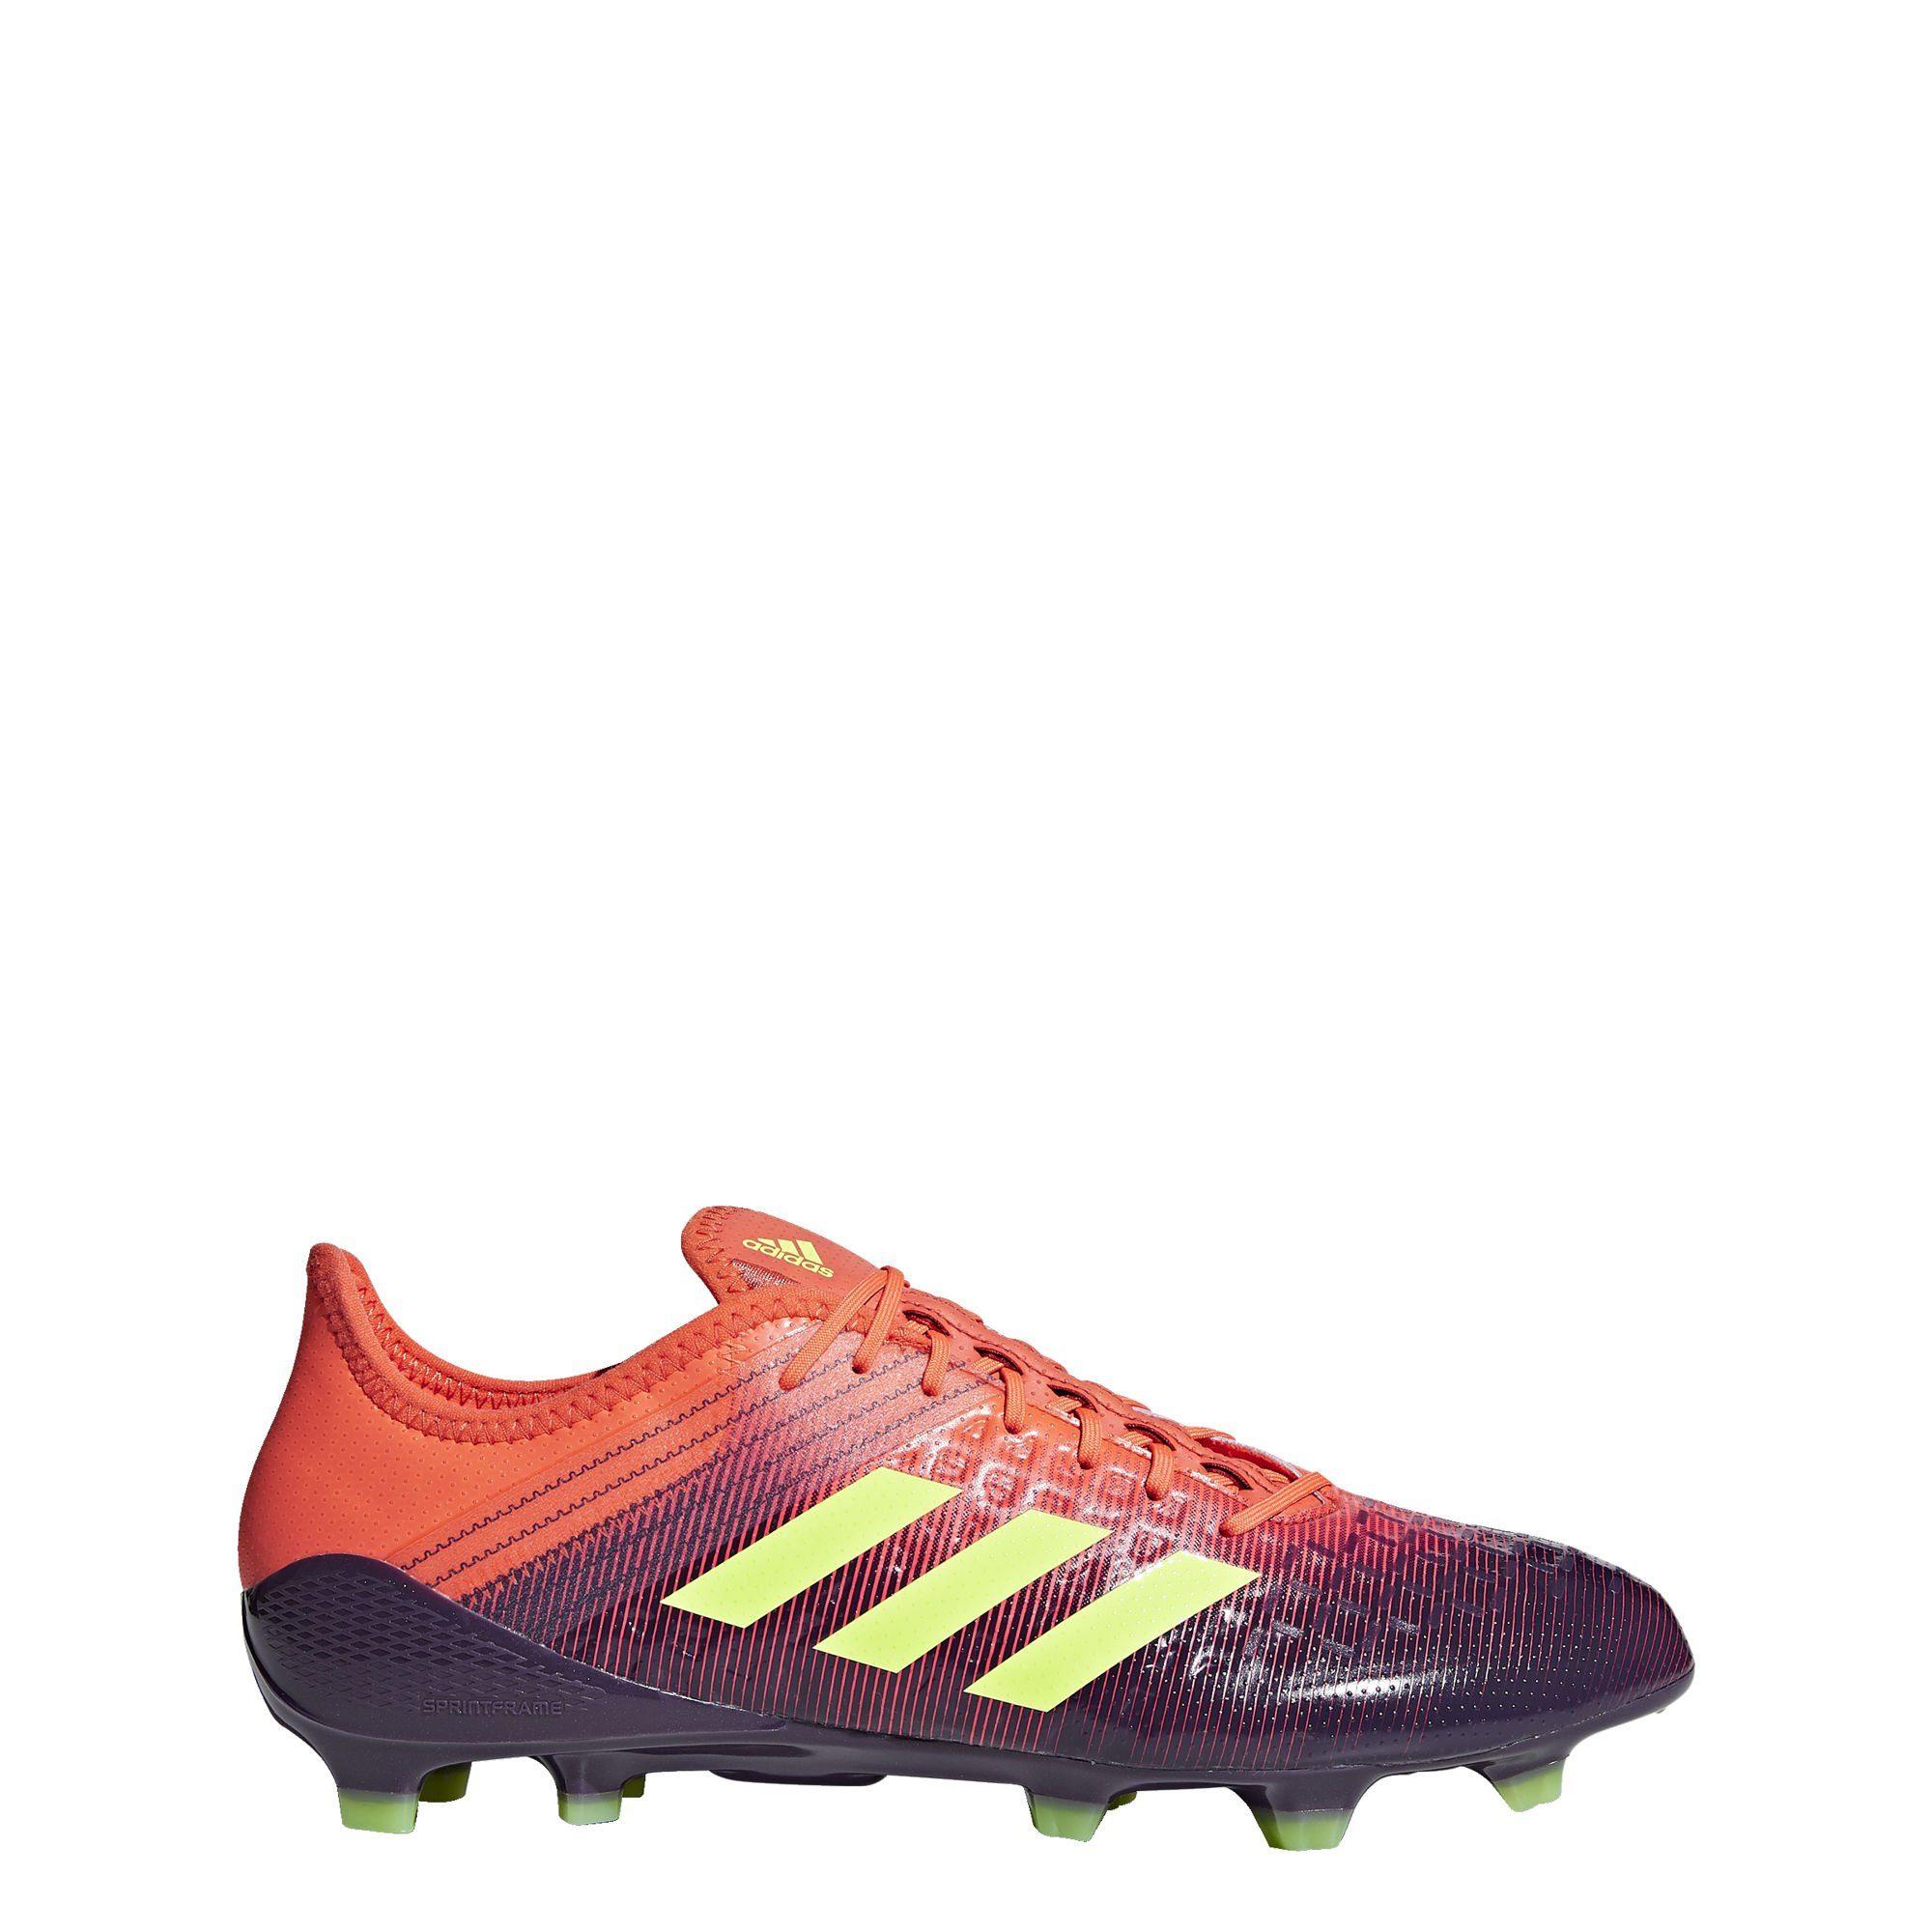 Malice Schuh« Predator »predator Adidas Performance Fußballschuh Online Fg Control KaufenOtto ikZOXuP